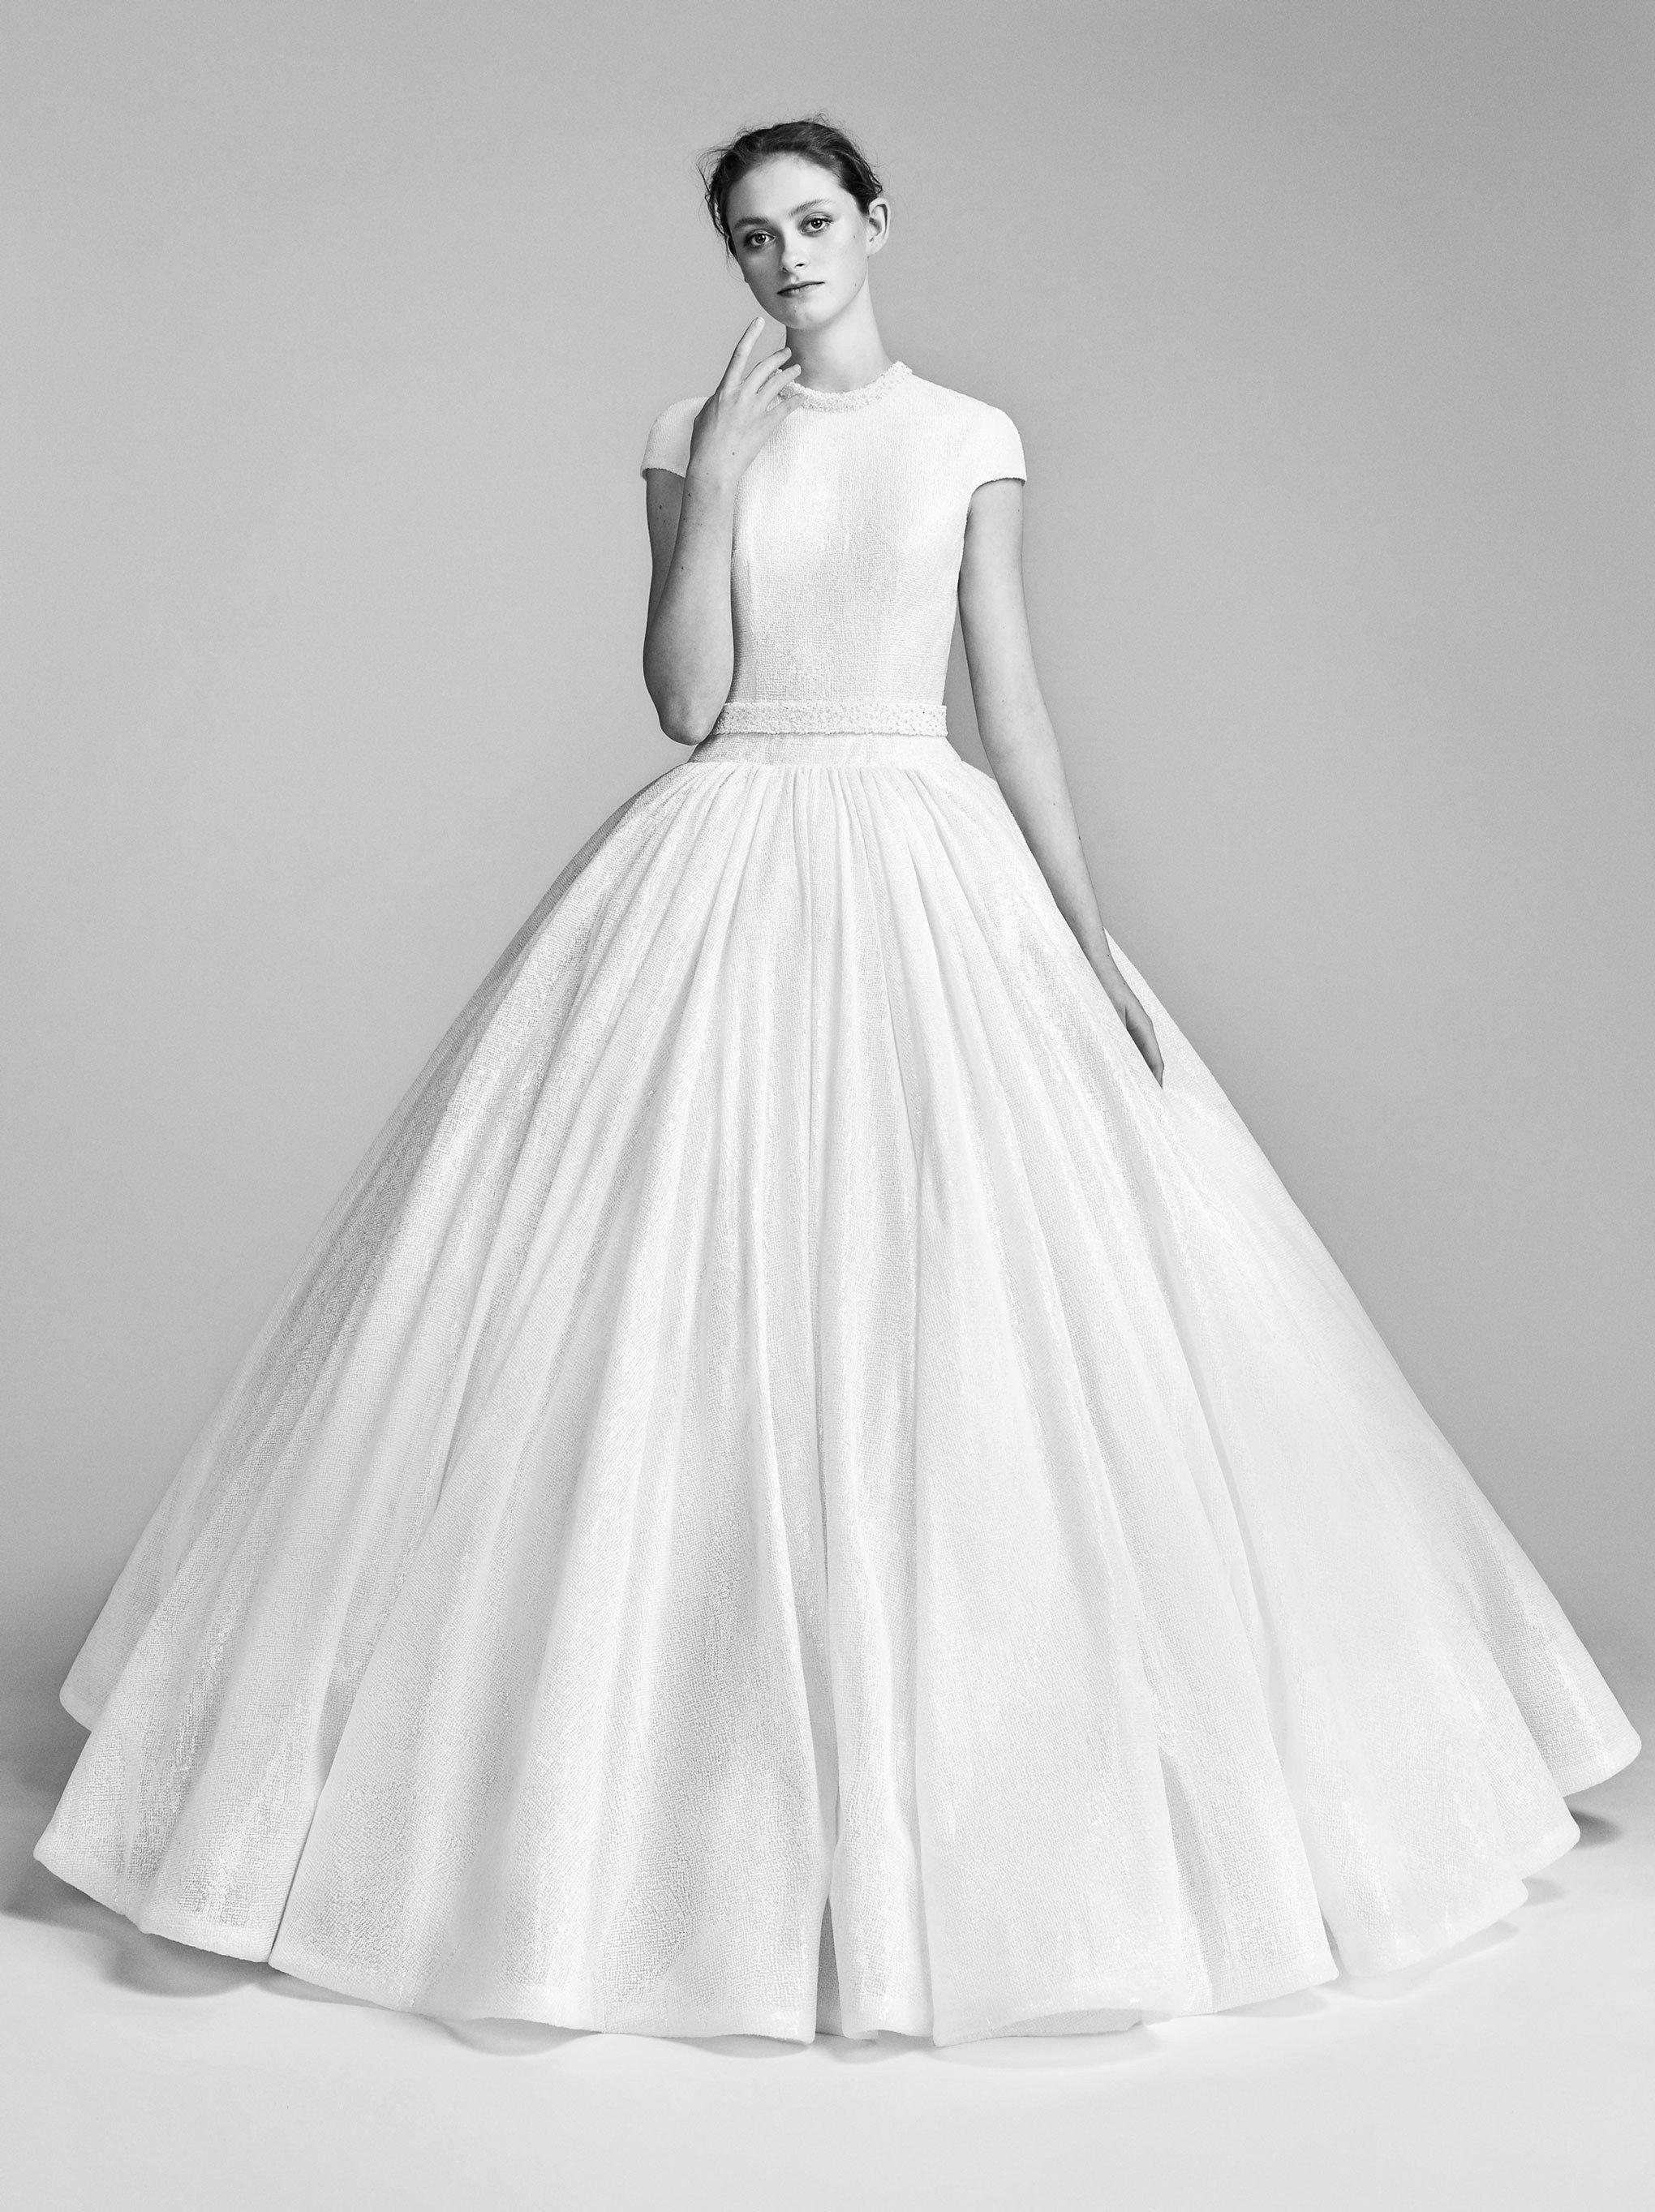 White dress bridal - Viktor Rolf Bridal Spring 2018 Fashion Show